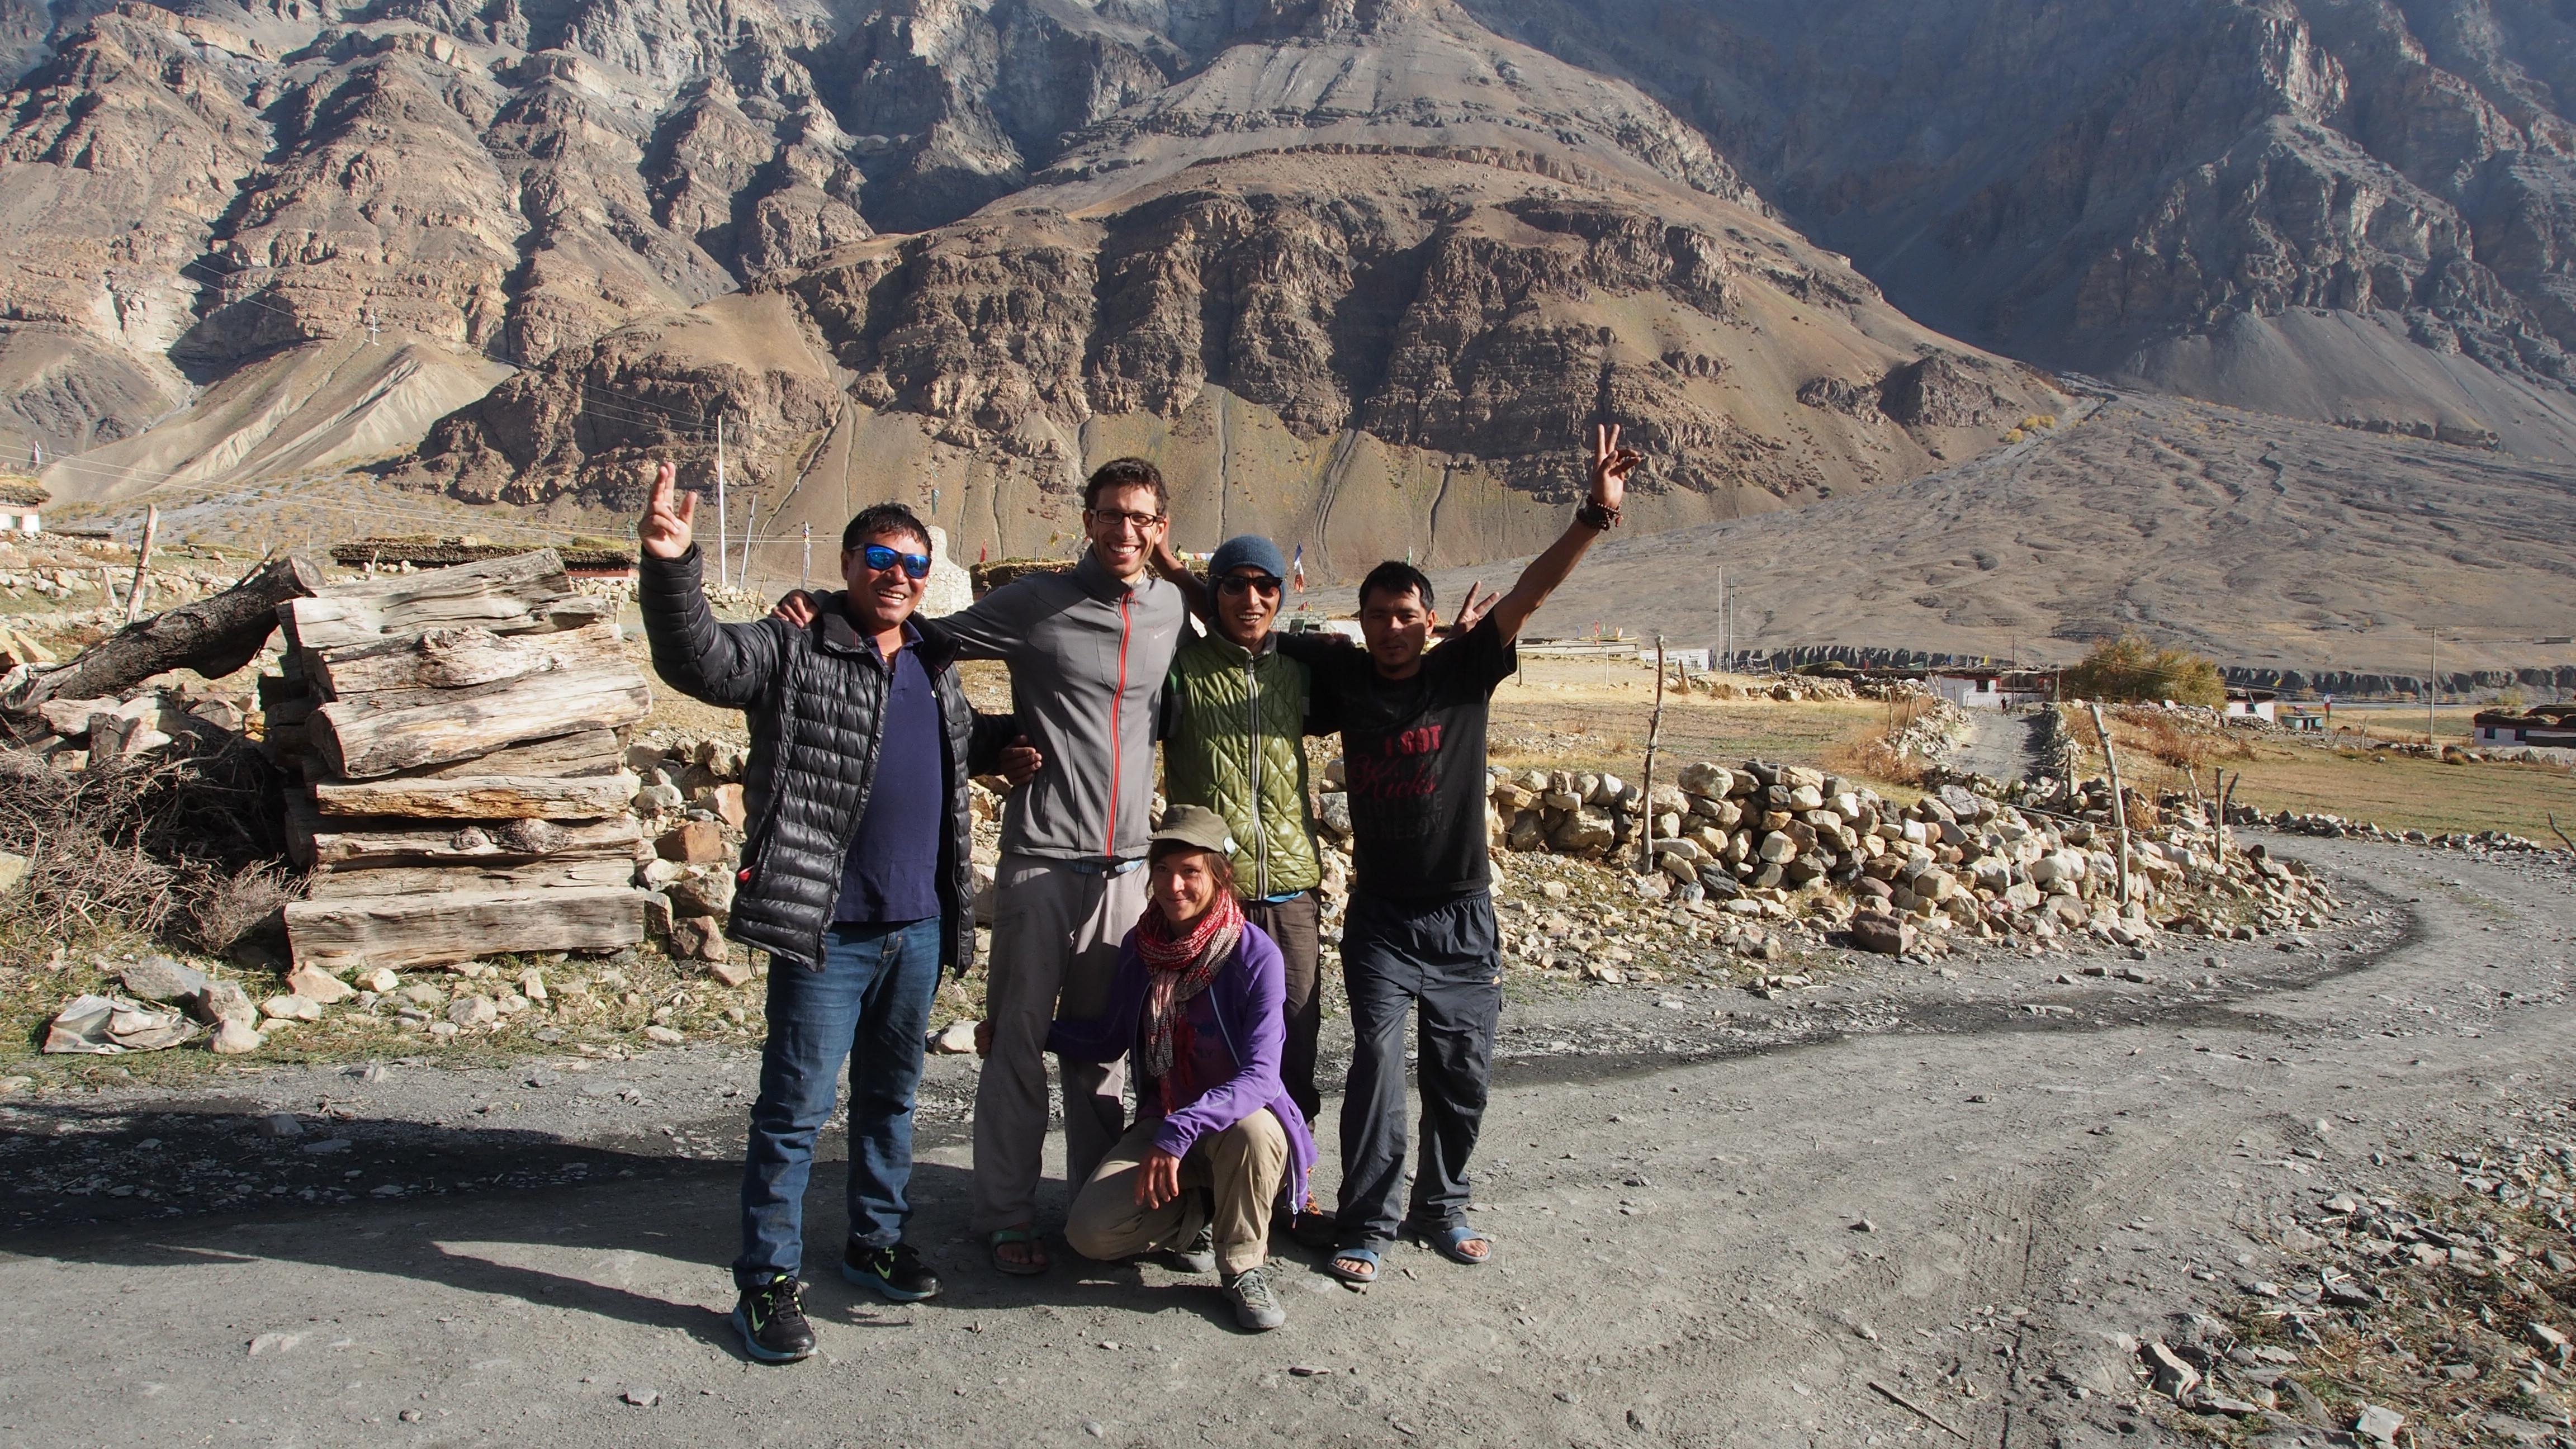 Notre super équipe de trek : RIgzin, Dorje, Lobsang